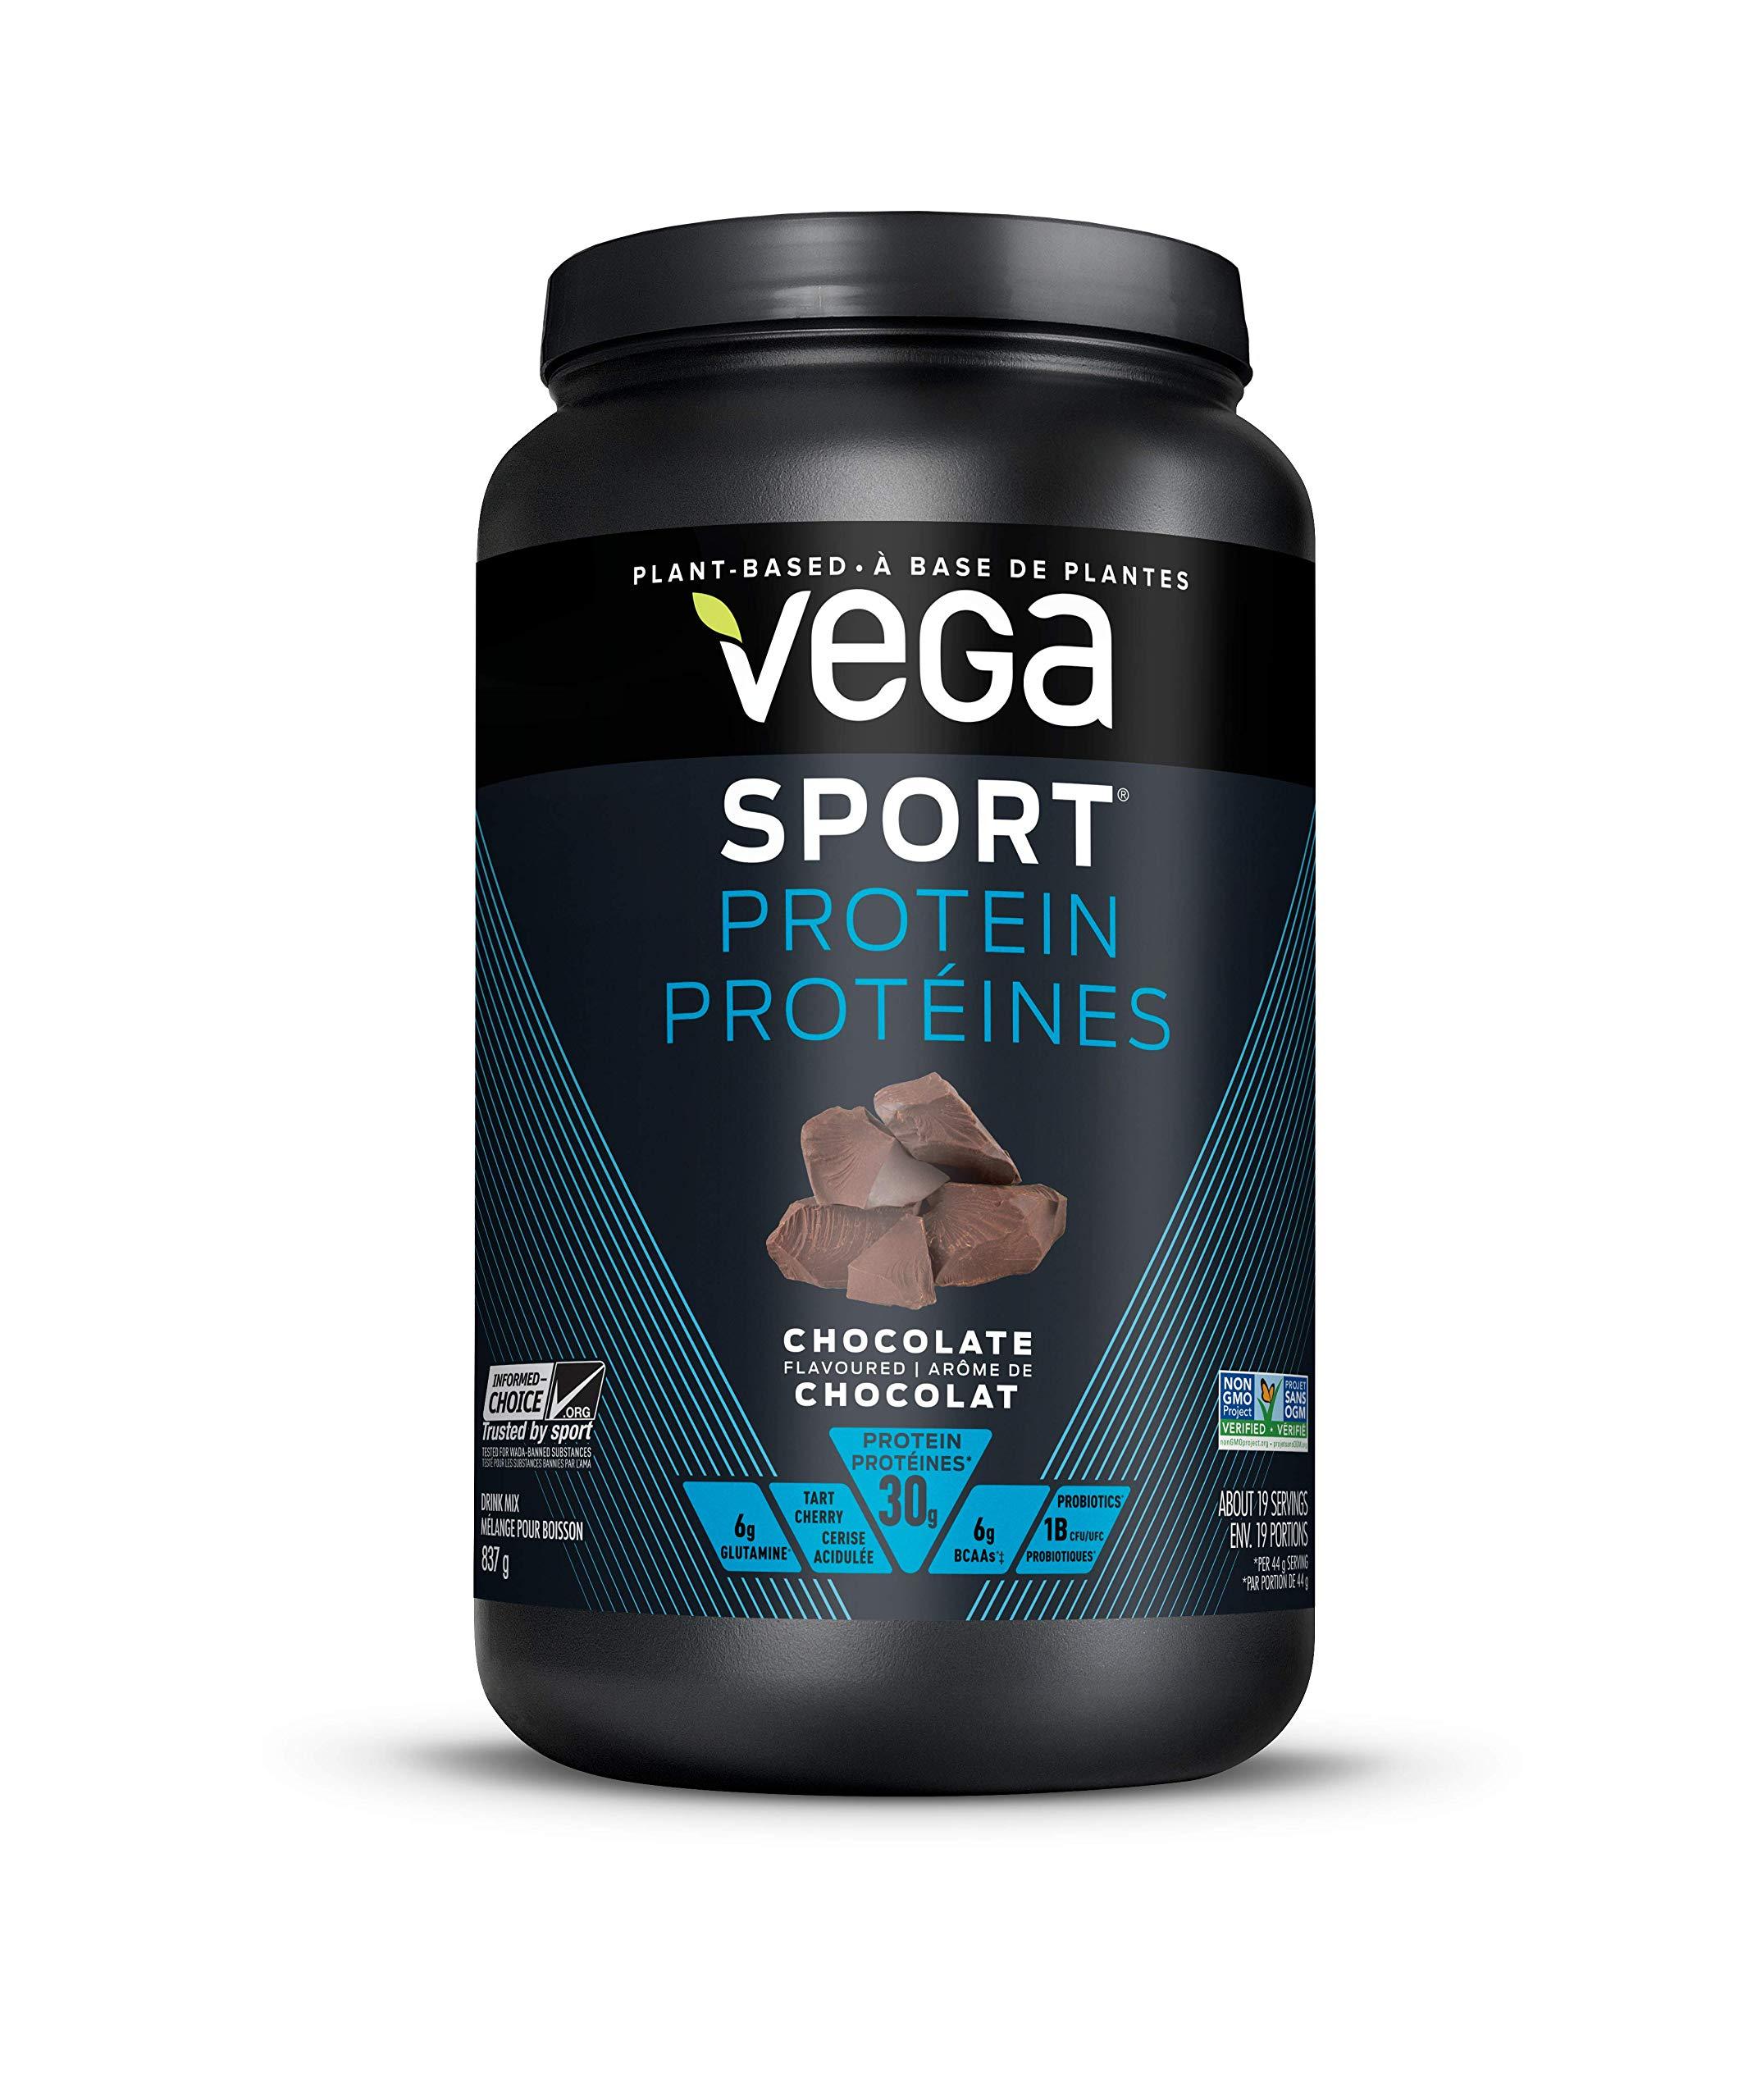 VEGA Sport Protein Chocolate Tub, 837 GR by Vega